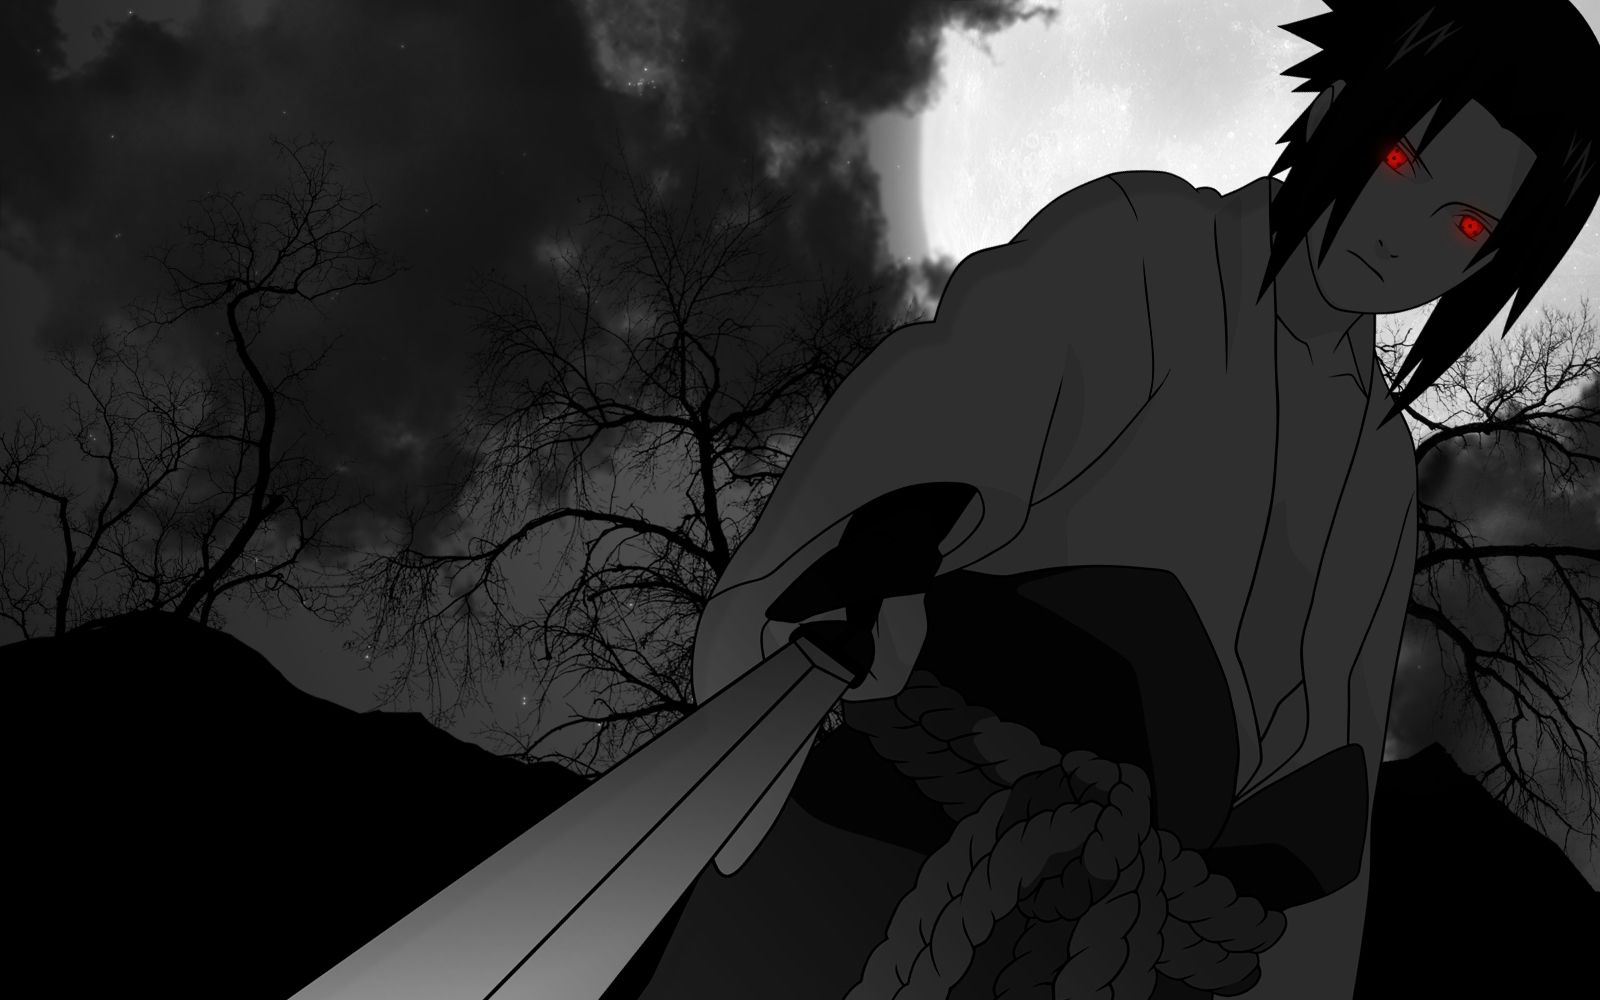 Uchiha Sasuke Chokuto Sword Full Hd Wallpaper Your Hd Wallpaper